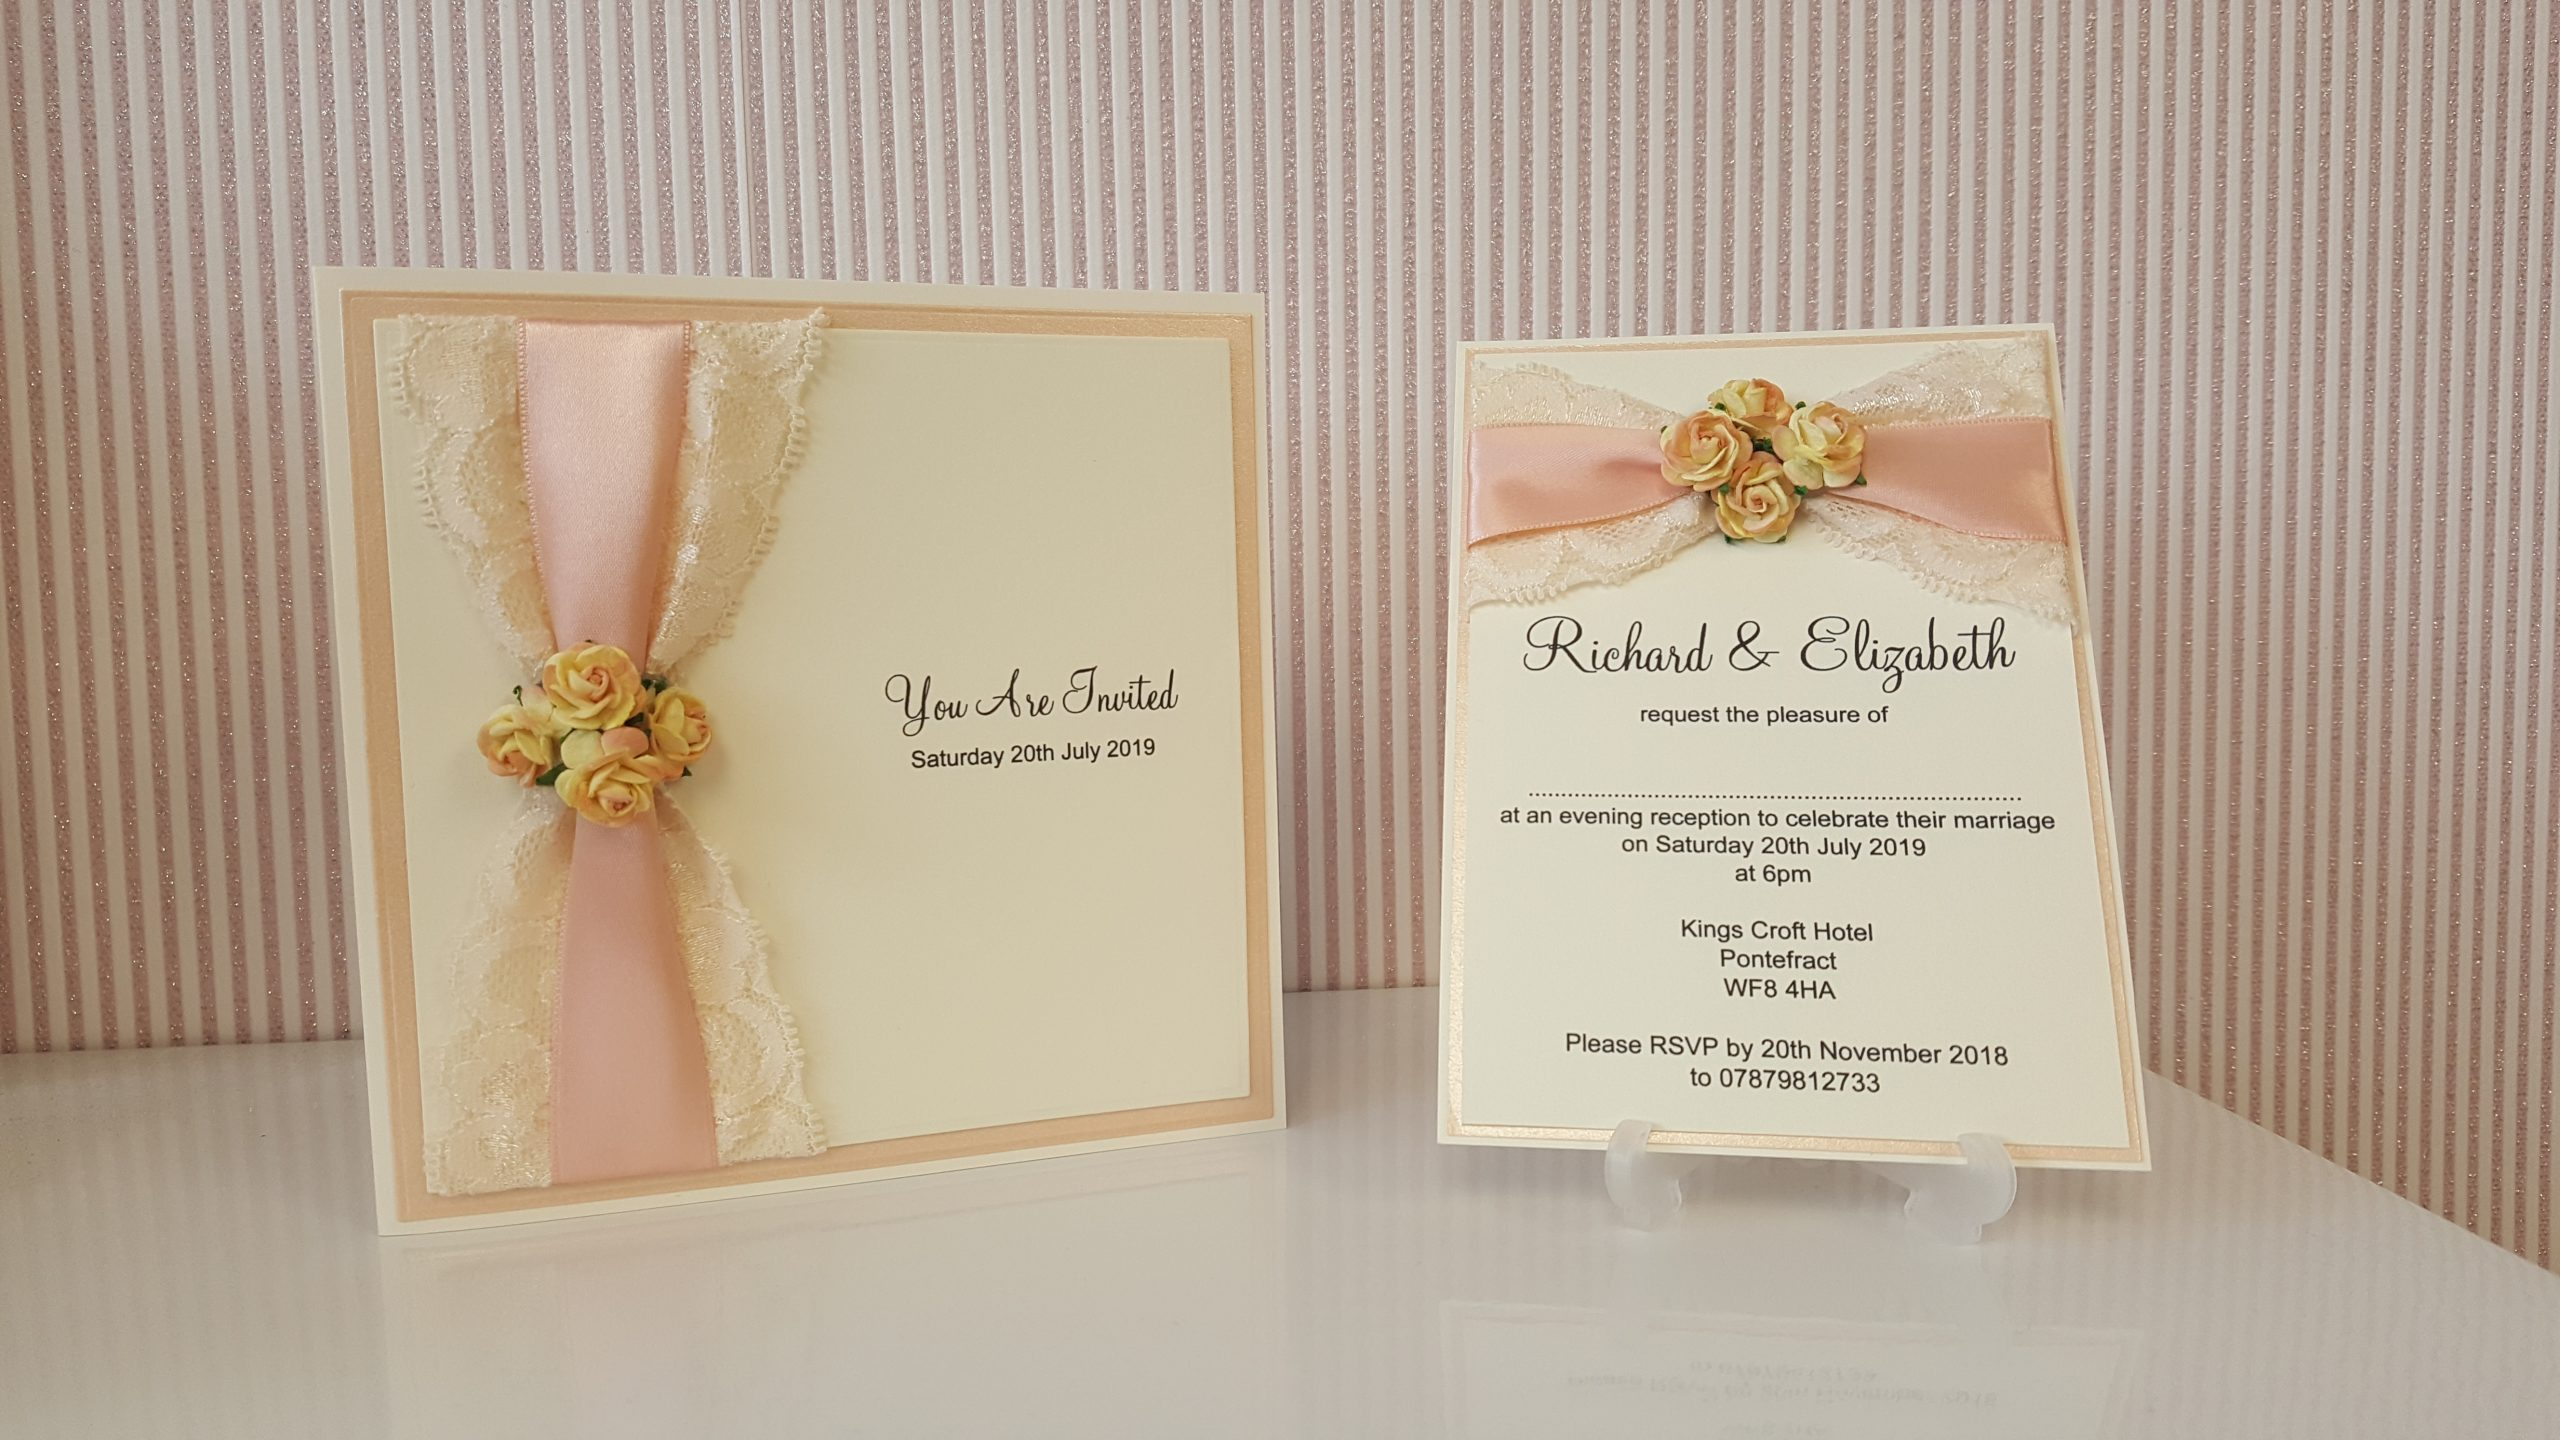 https://tietheknotwedding.co.uk/listings/yorkshire-wedding-invites-and-engraving-ltd